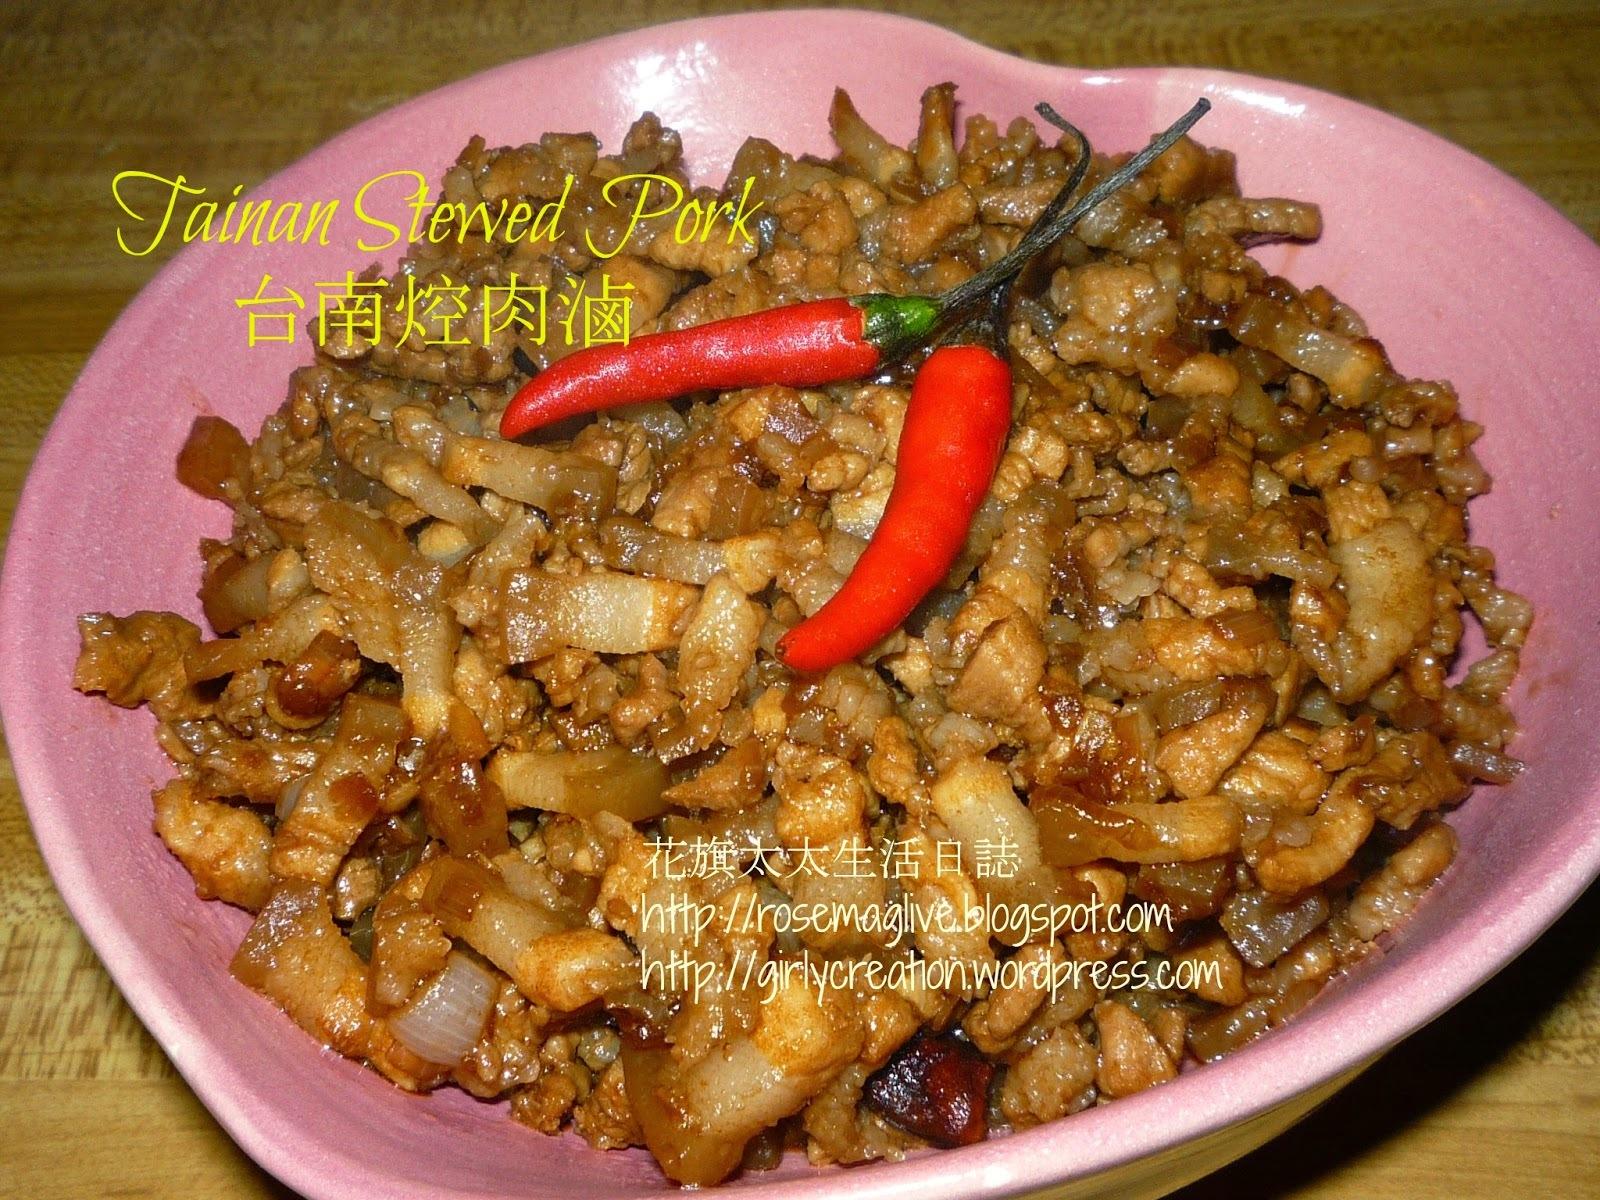 台南焢肉滷 Tainan Stewed Pork